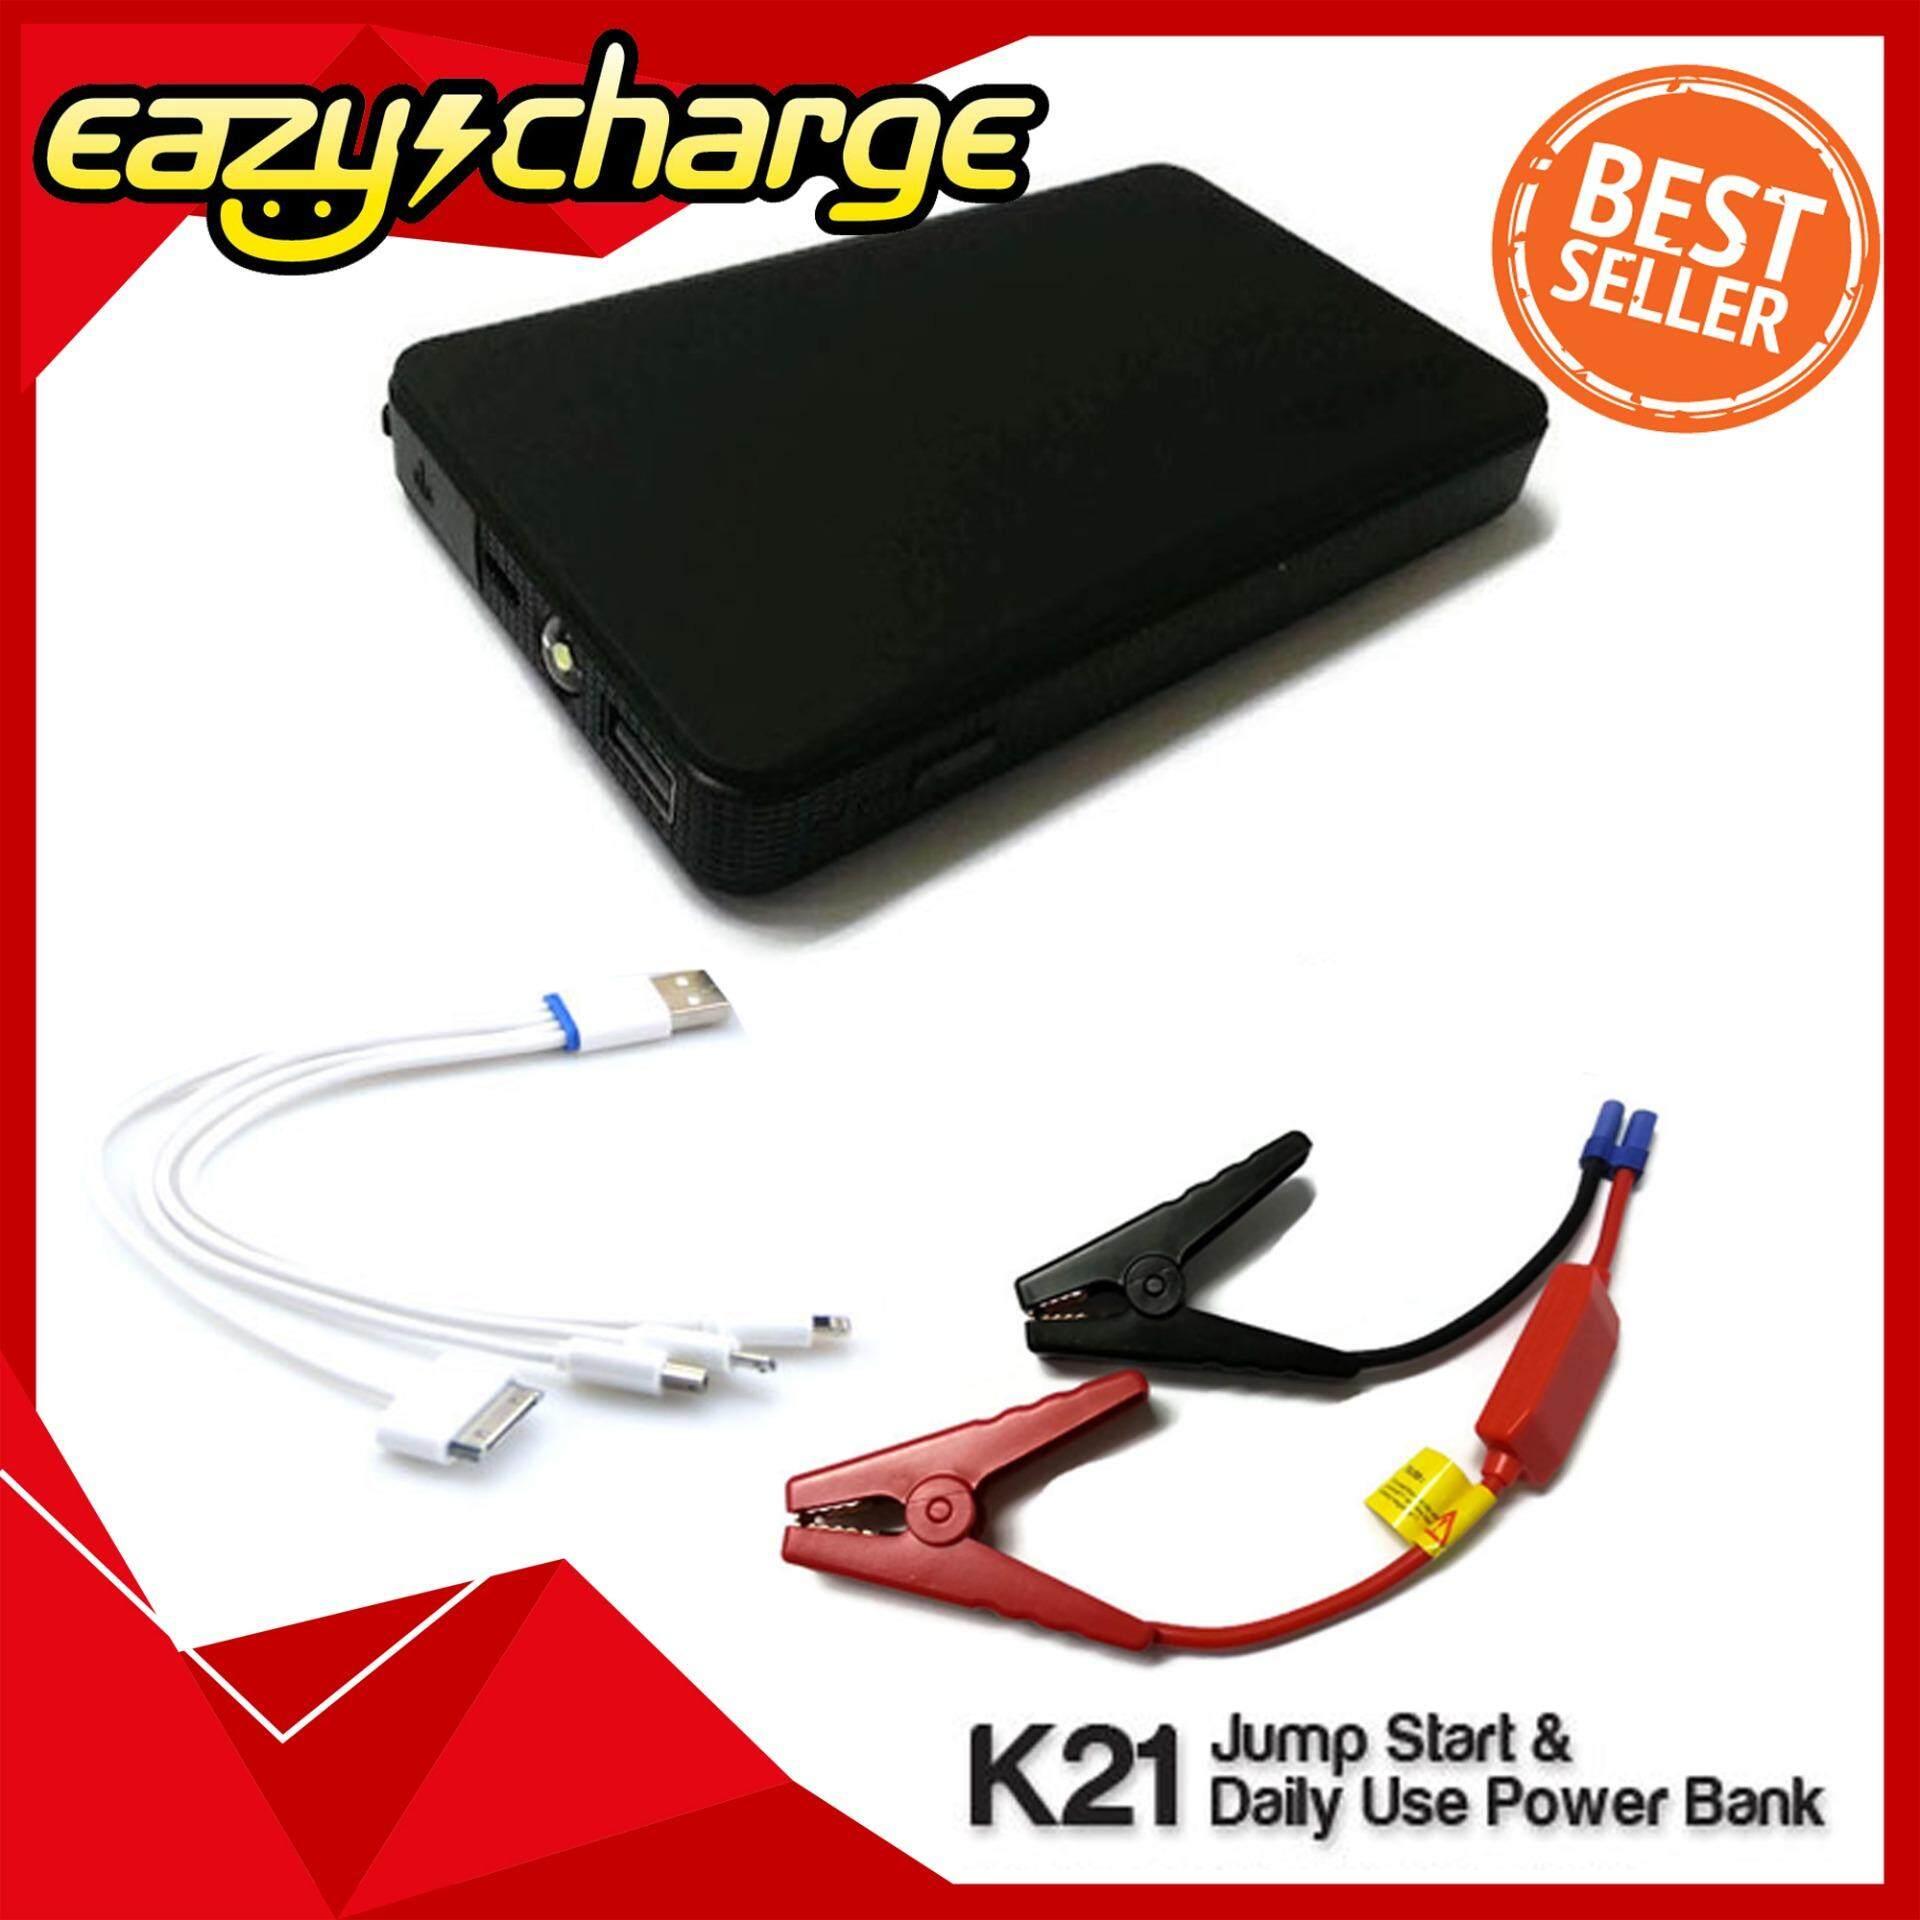 EazyCharge แบตสำรอง + Jump Starter รุ่น K21 (Black)